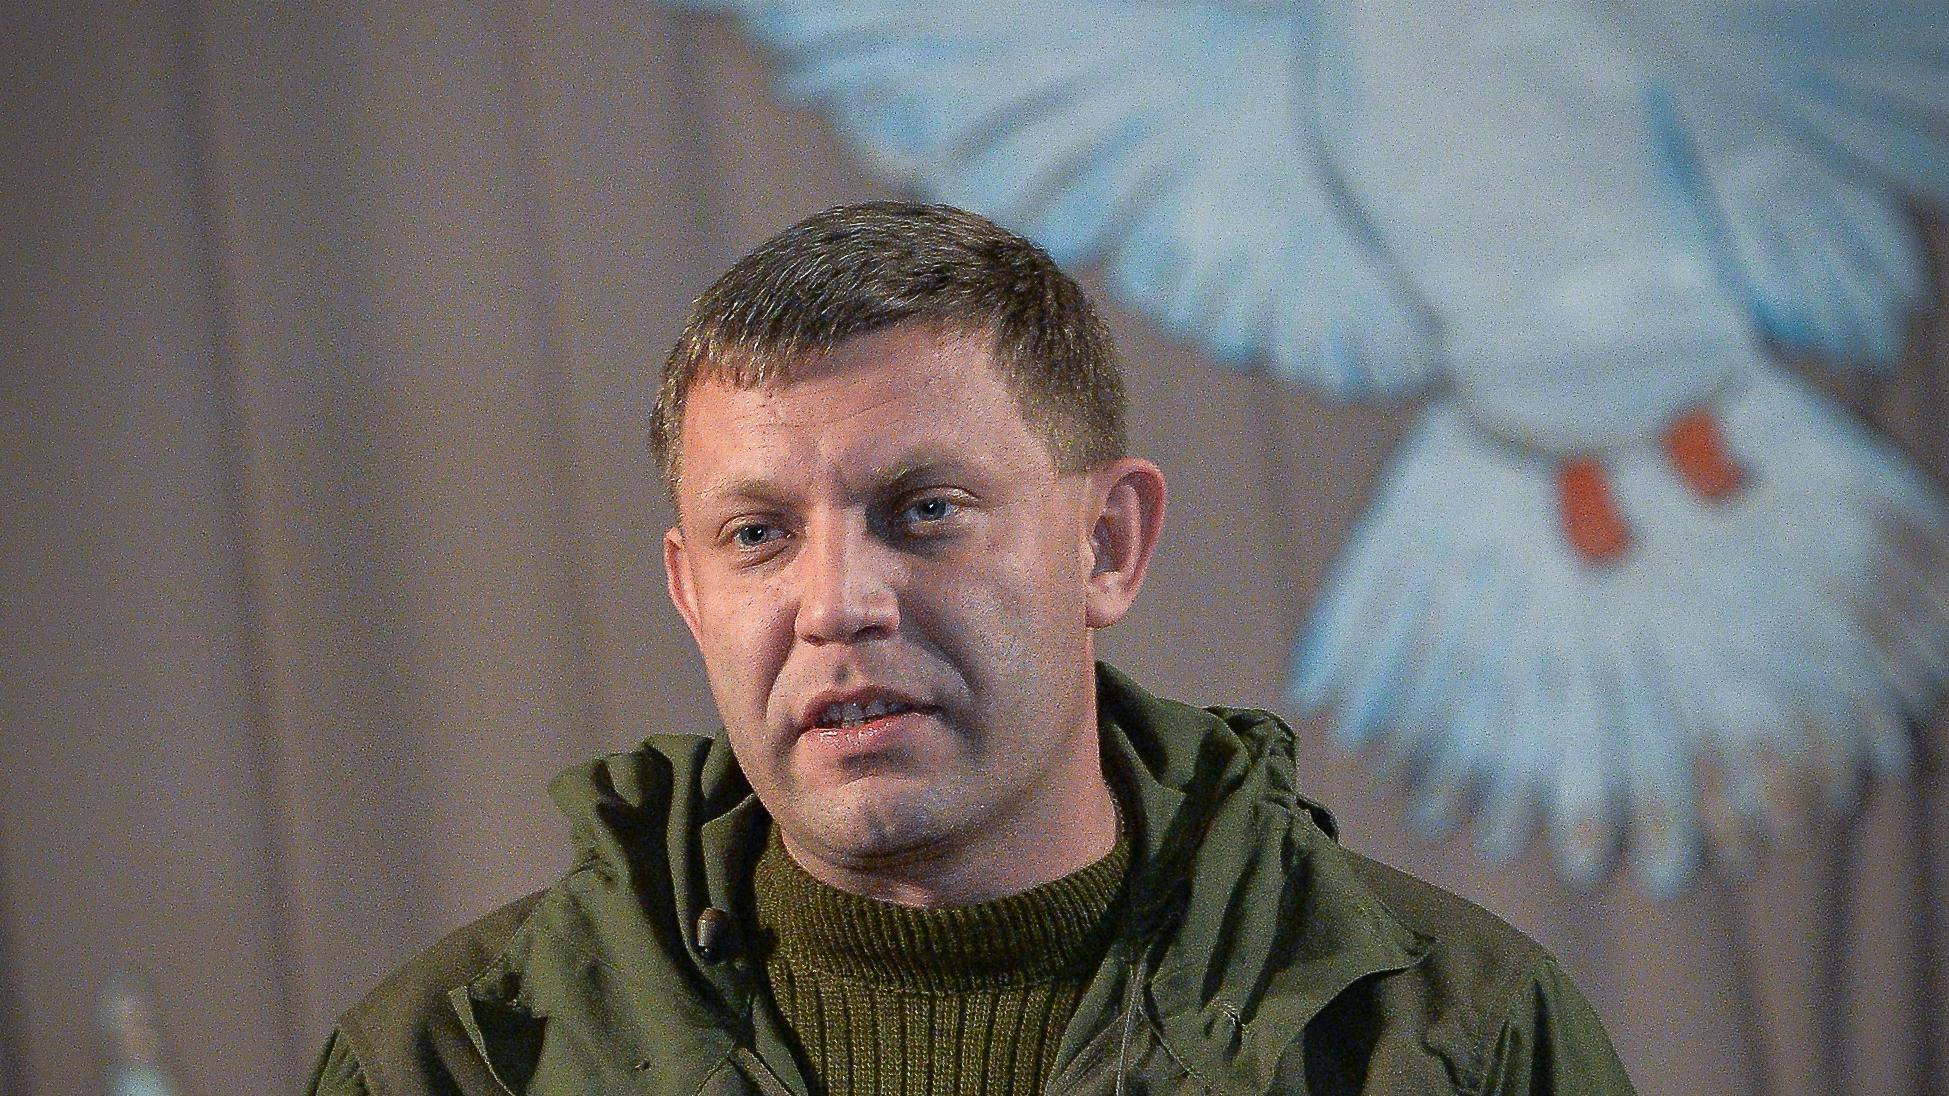 Alexander Zakharchenko, Prime Minister of the People's Republic of Donetsk, wurde bei einem Anschlag getötet